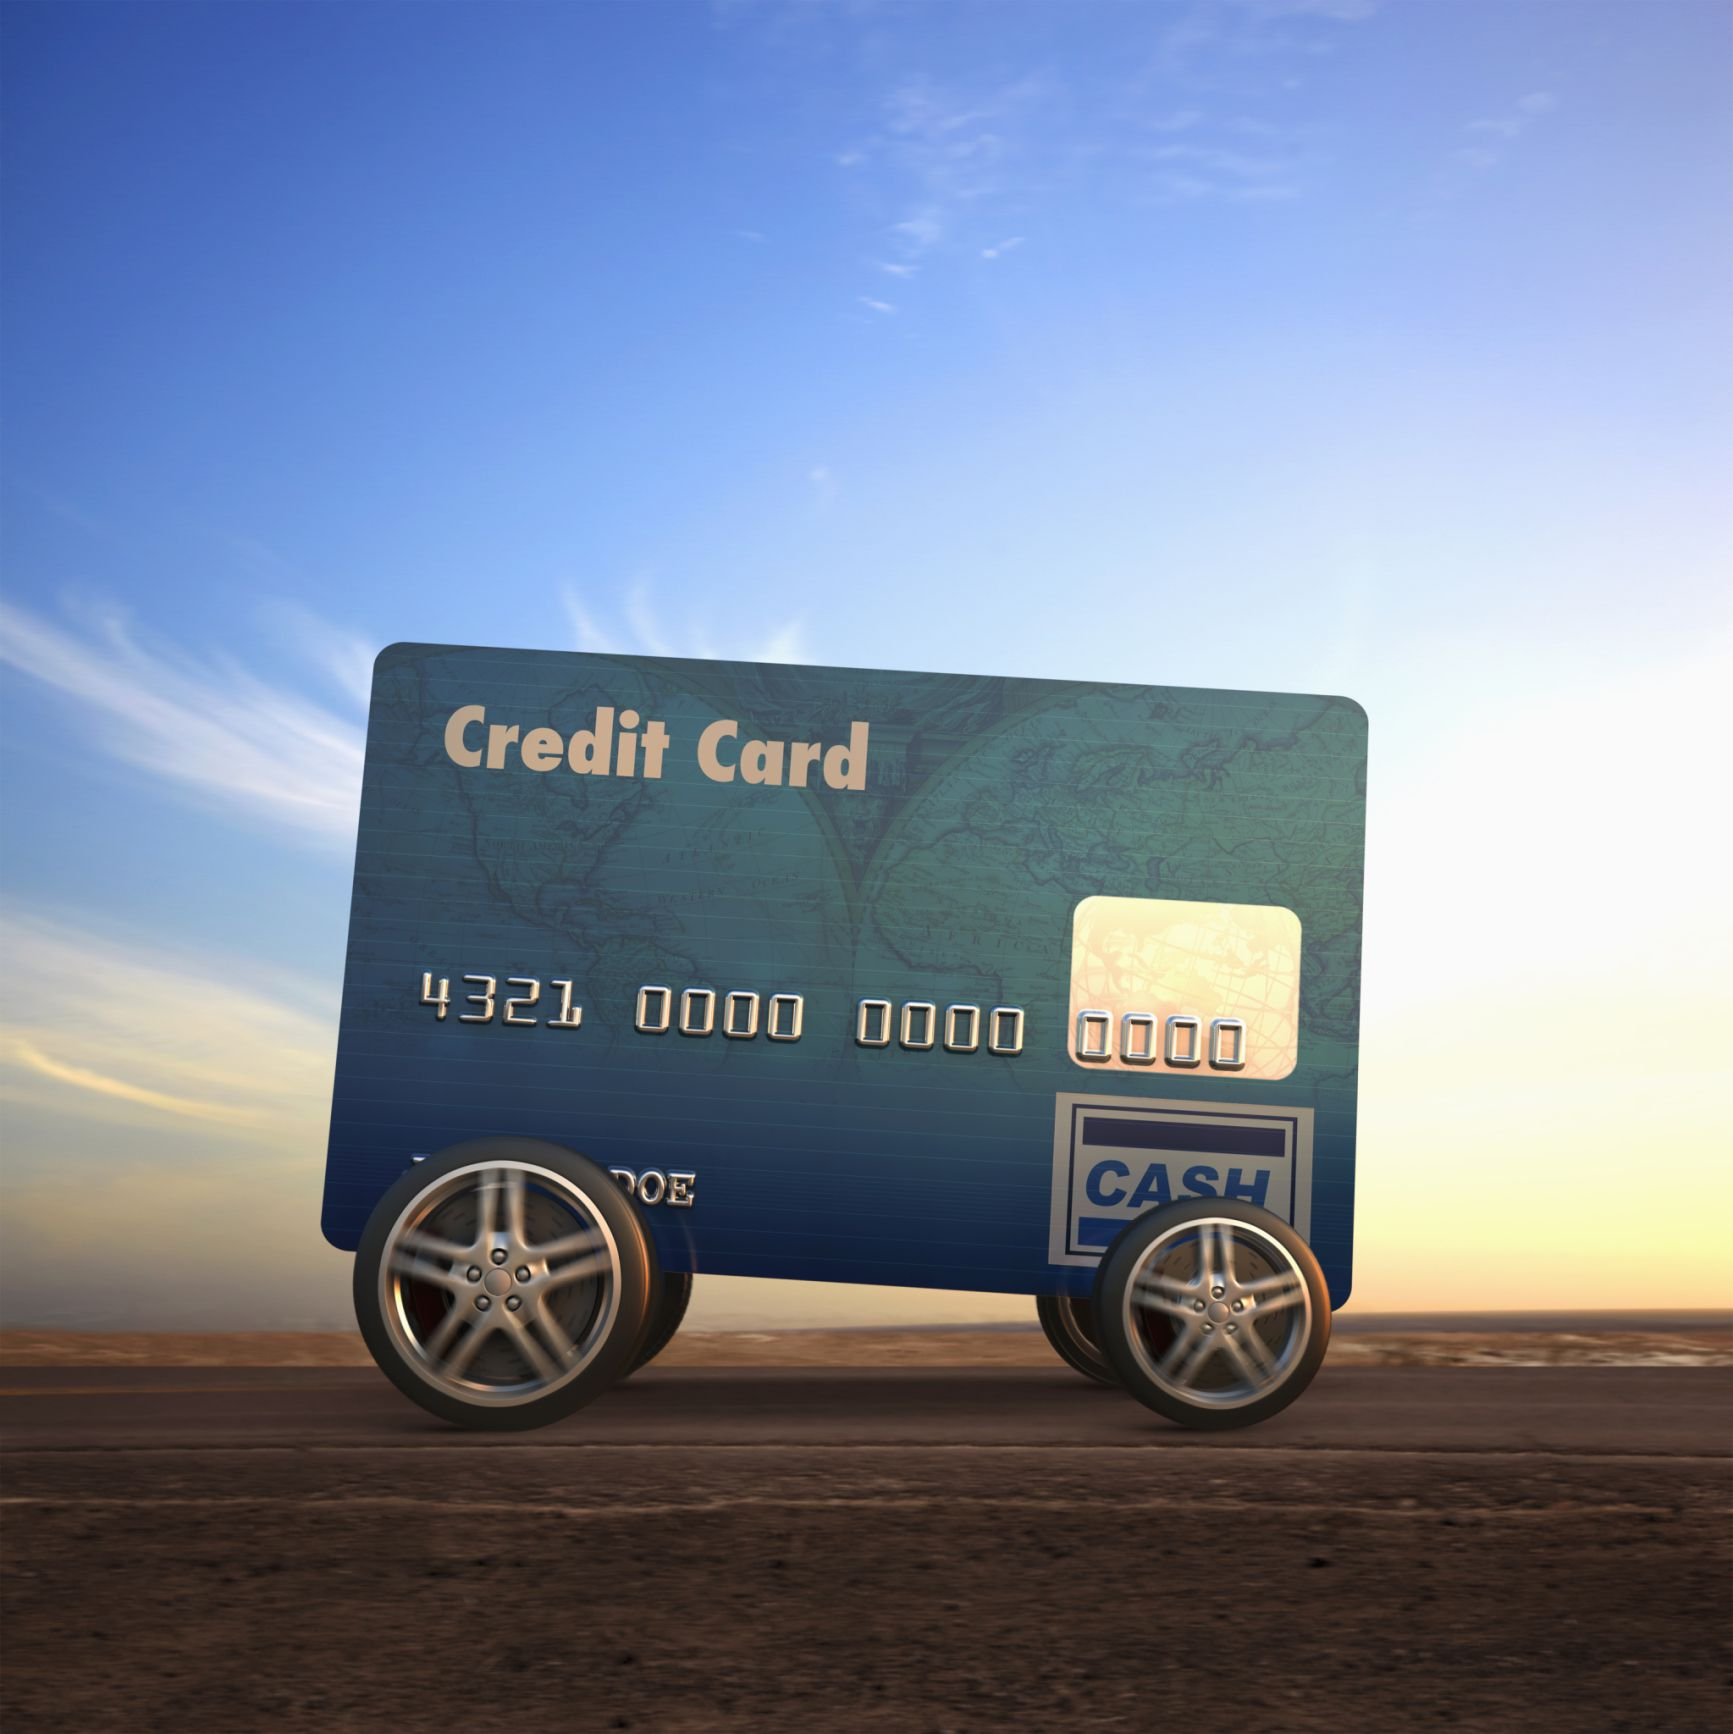 Aaa Car Service >> AAA Member Rewards Visa Credit Card Review